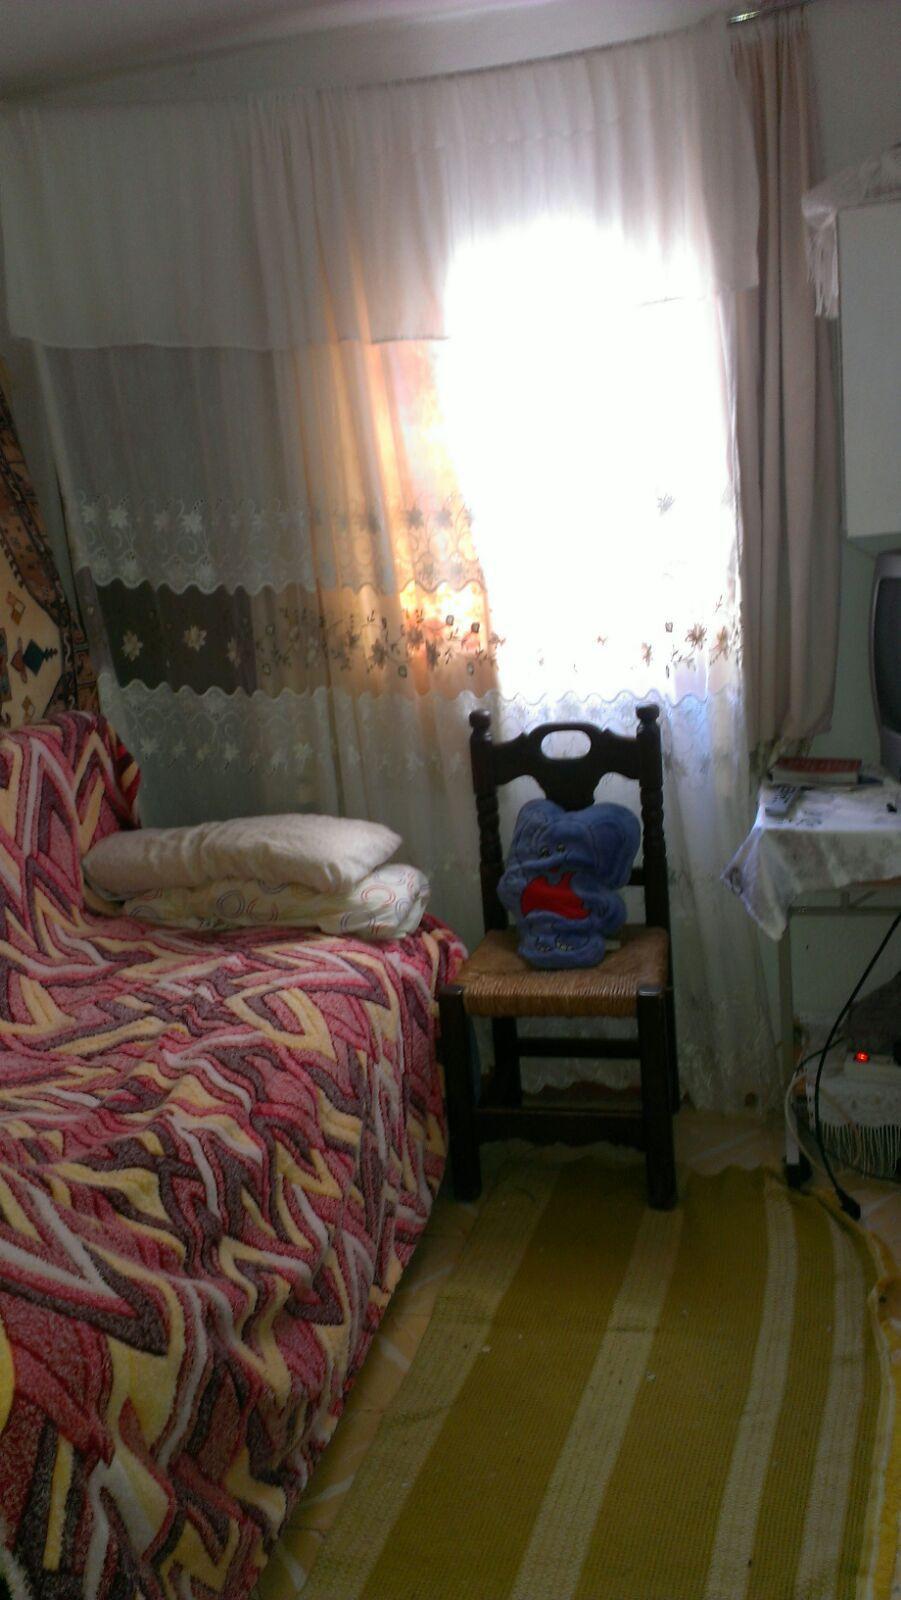 2 Bedroom Townhouse for sale Ojén